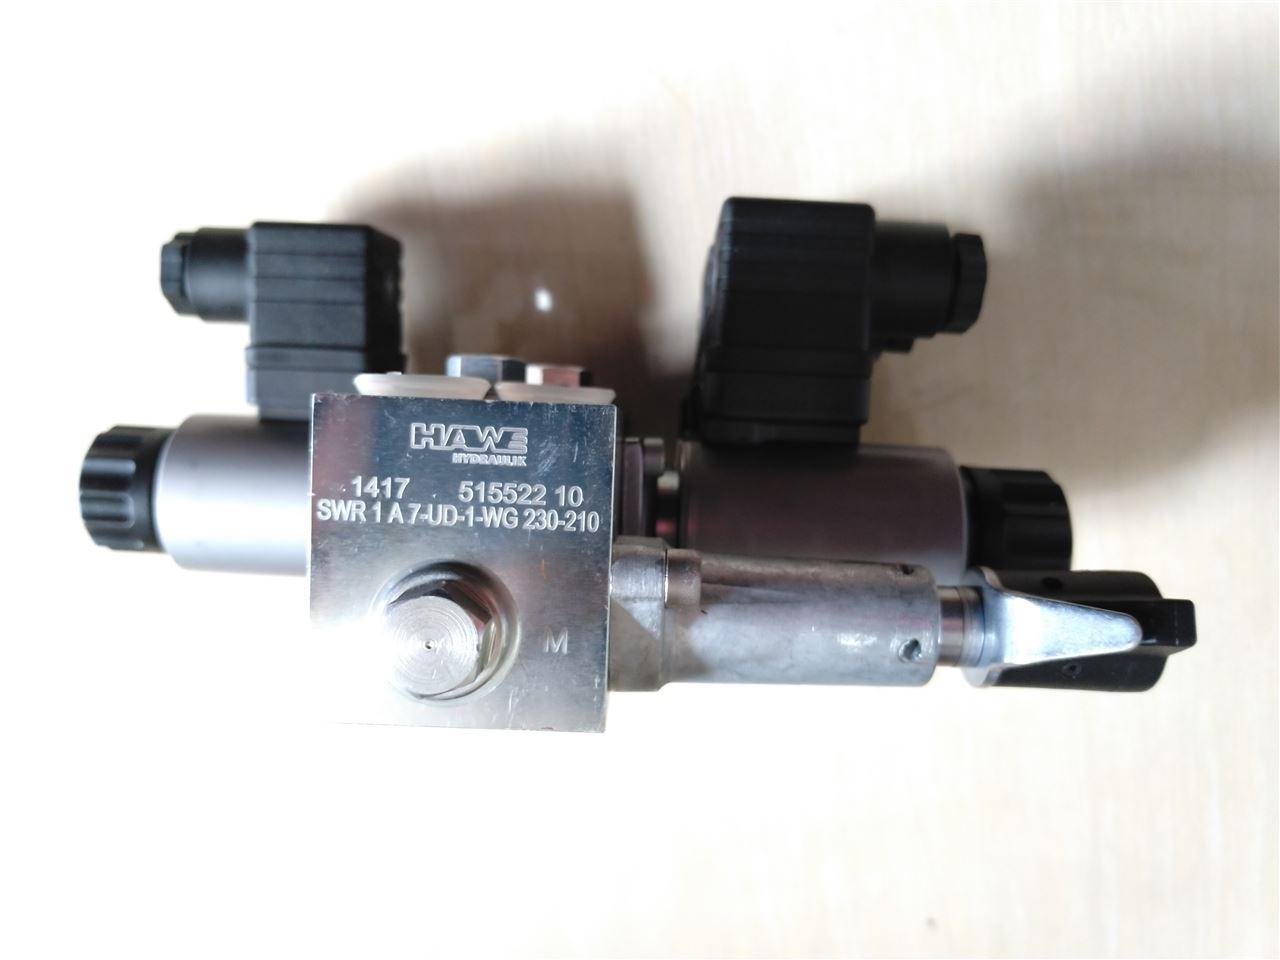 SWR1A7-UD-1-WG230-210